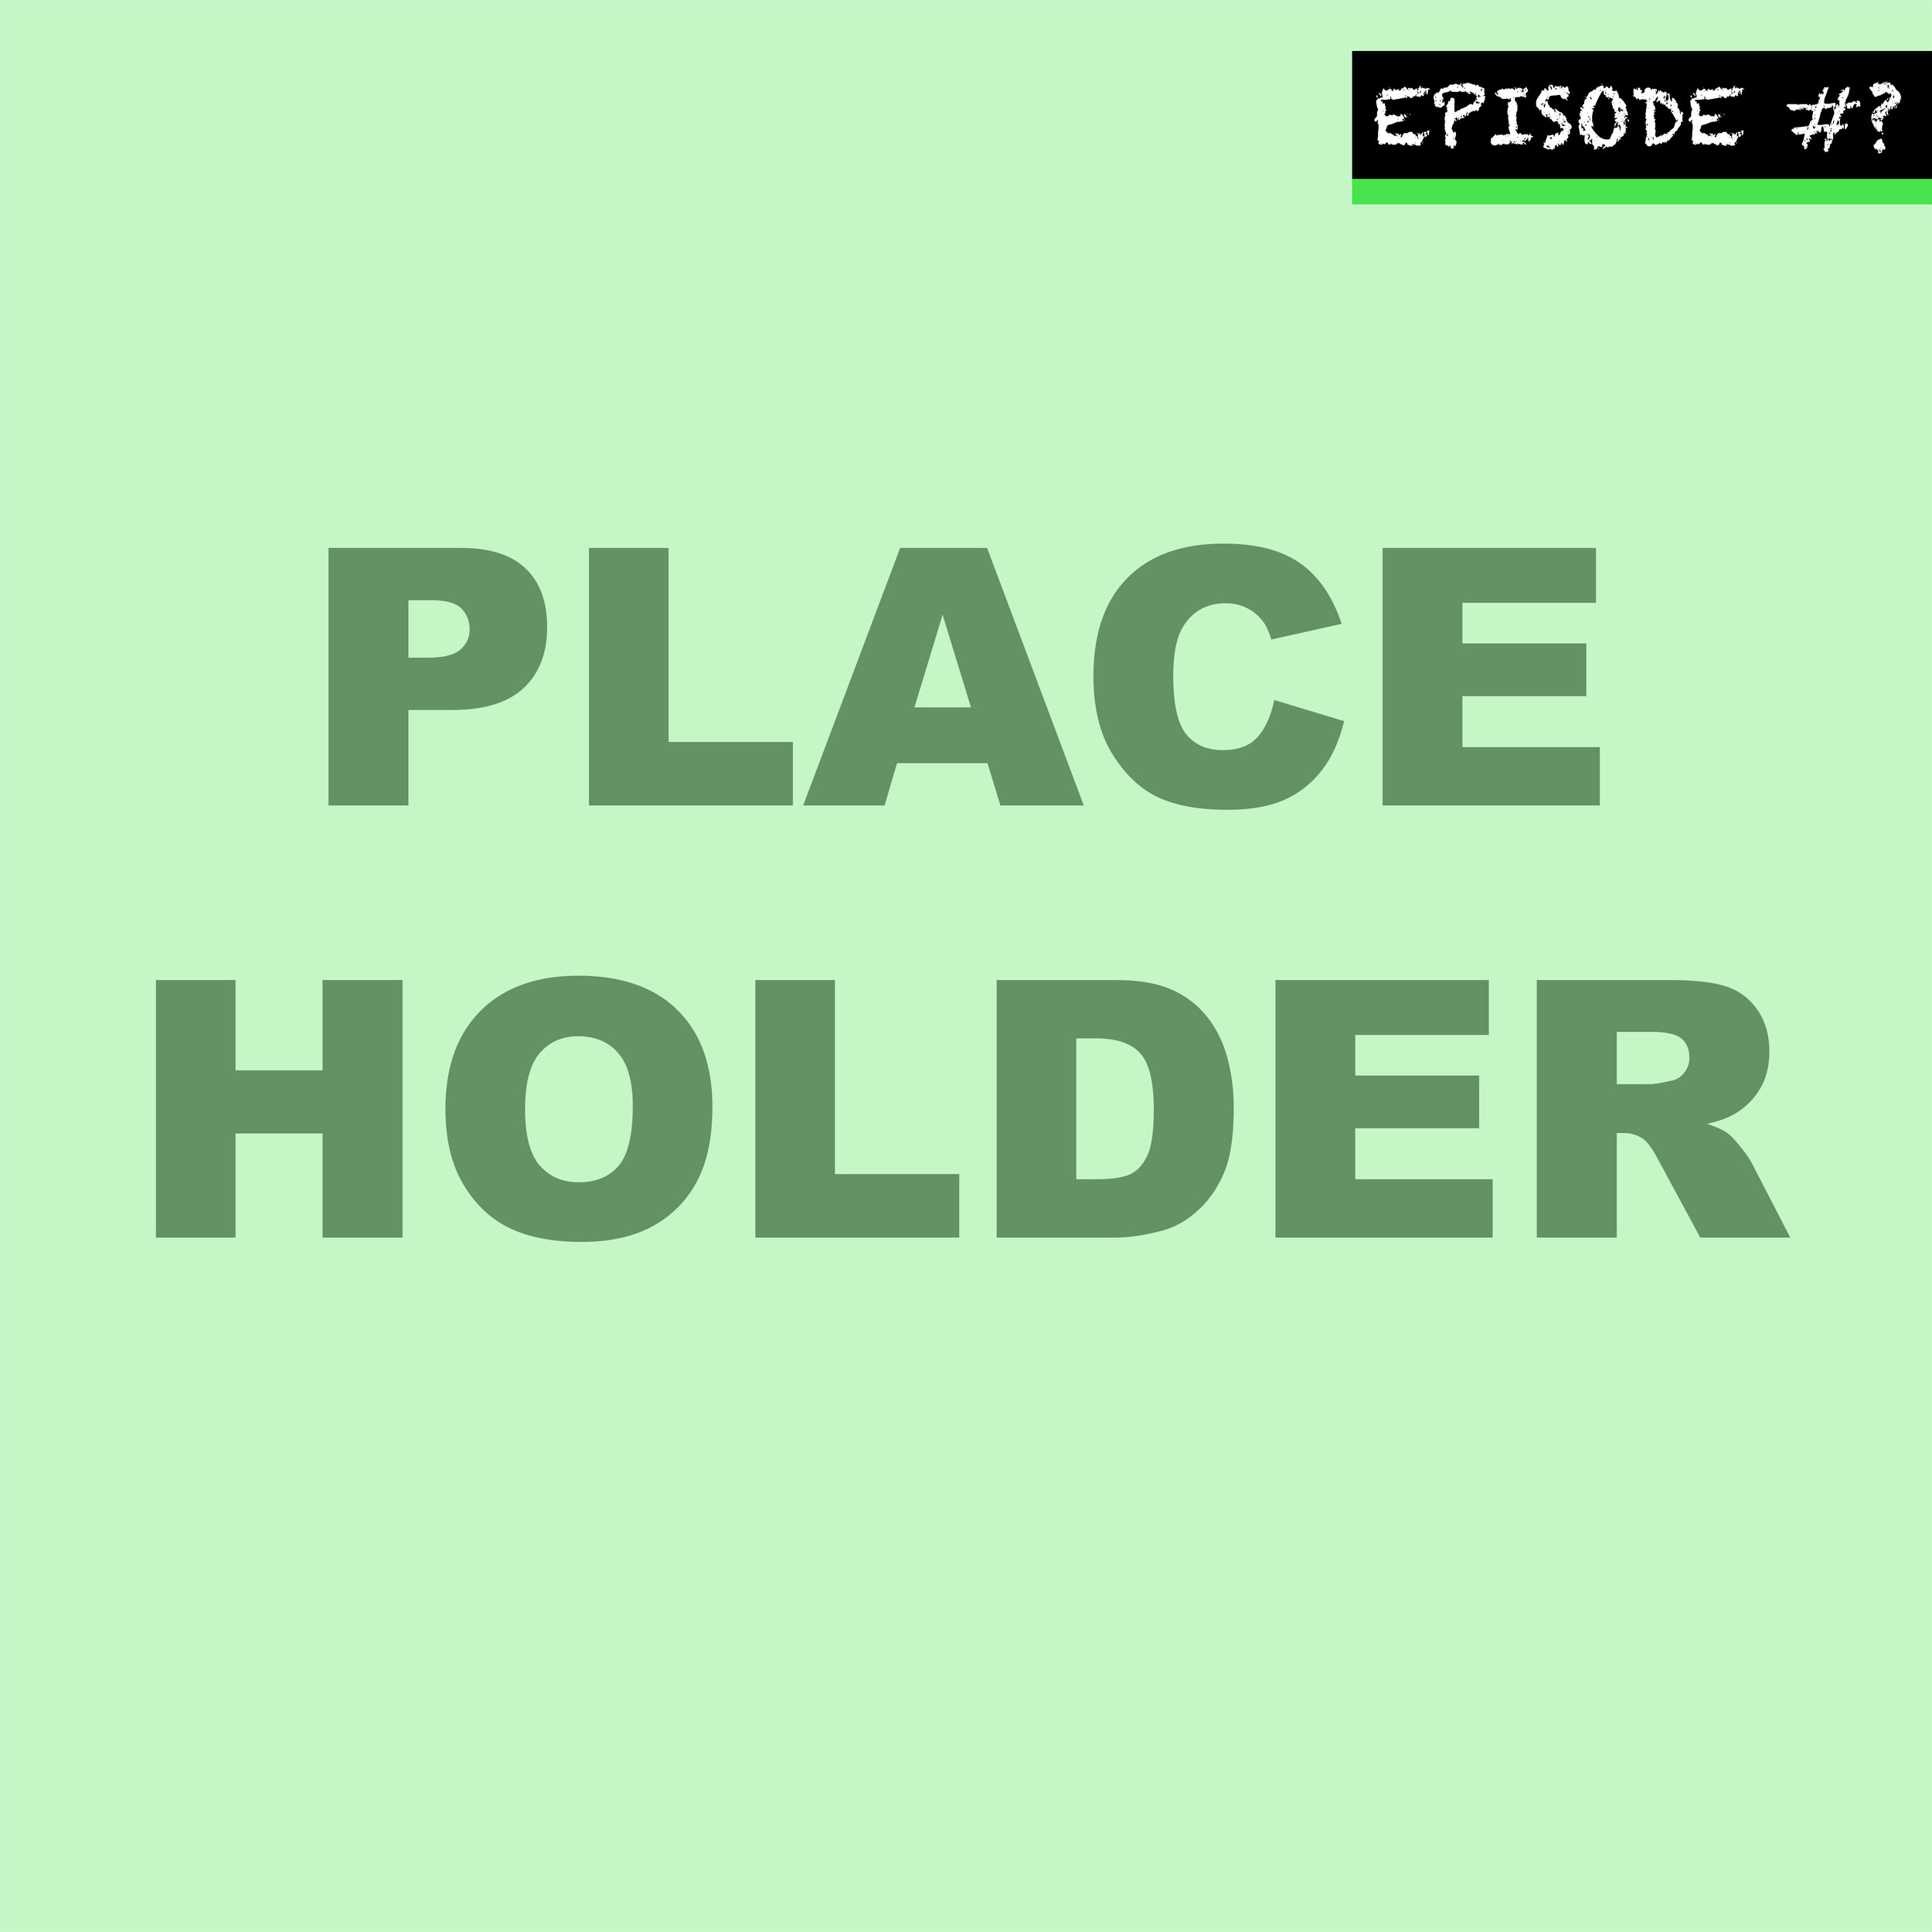 PLACE HOLDER - aka DRAFT